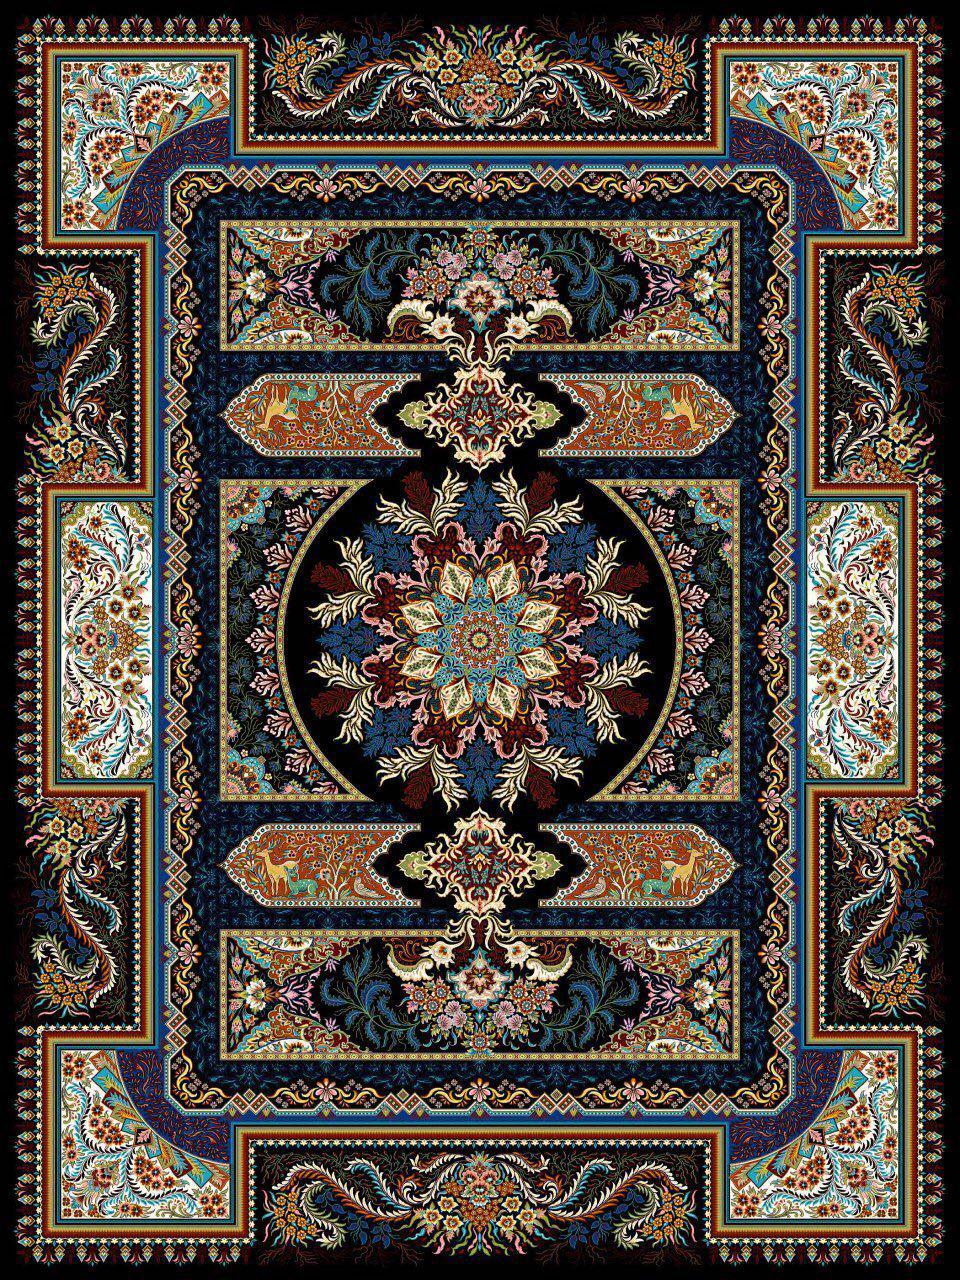 فرش محتشم کاشان 700 شانه